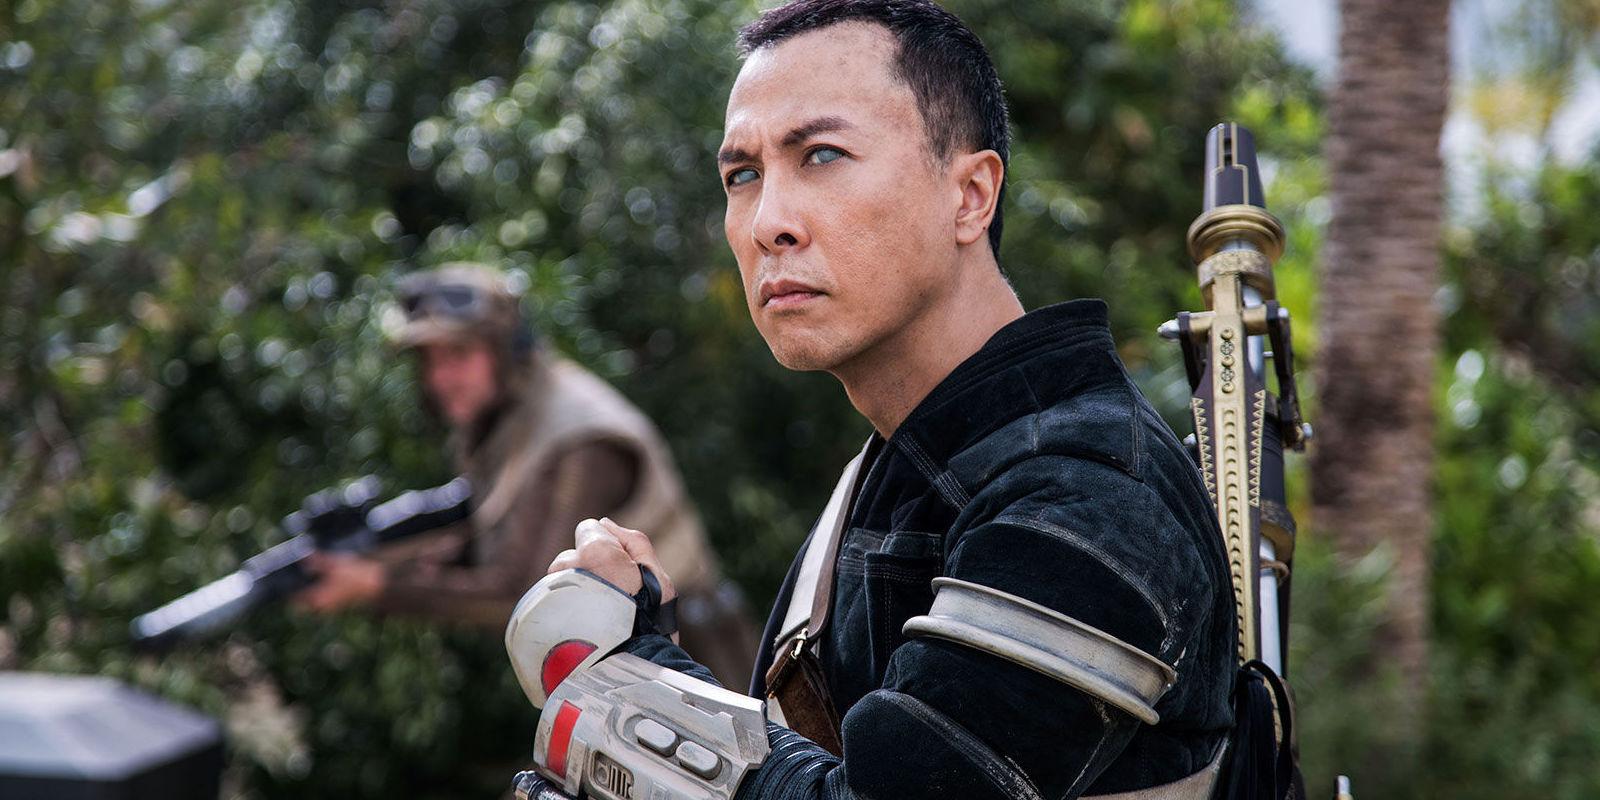 Star Wars: Rogue One - Donnie Yen as Chirrut Imwe